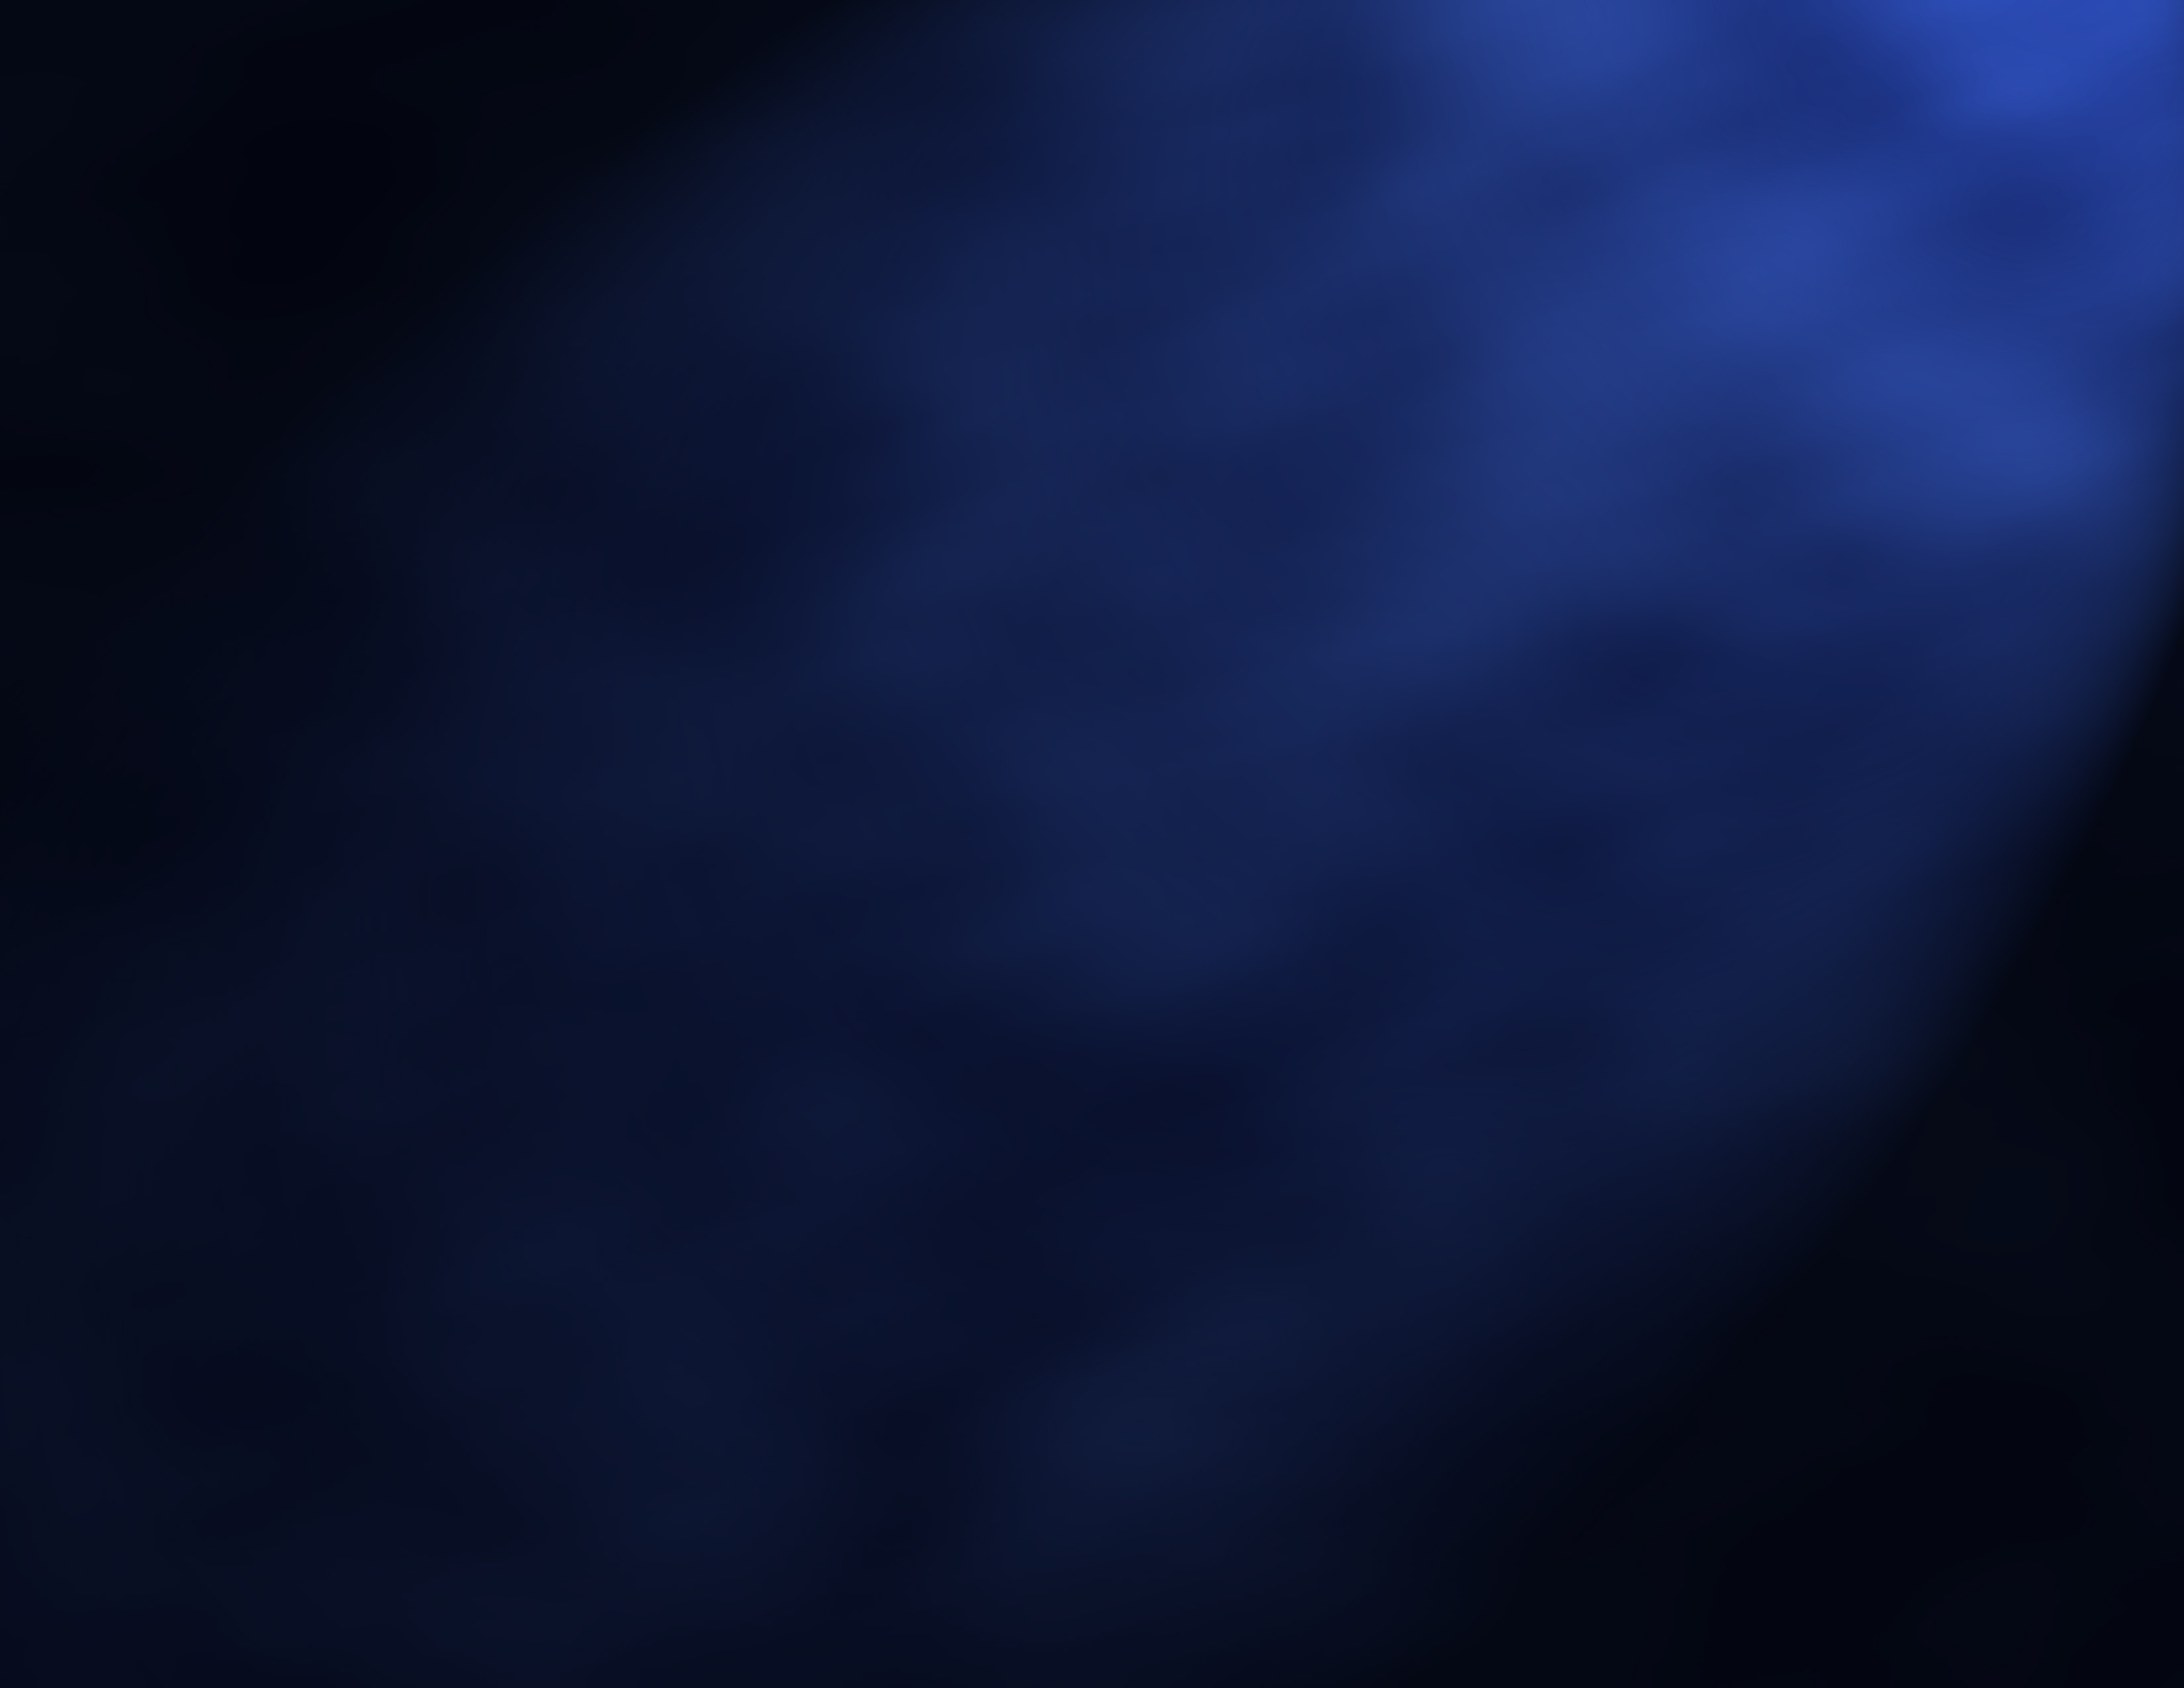 bigstock-Blue-Smokey-Background-2360867.jpg